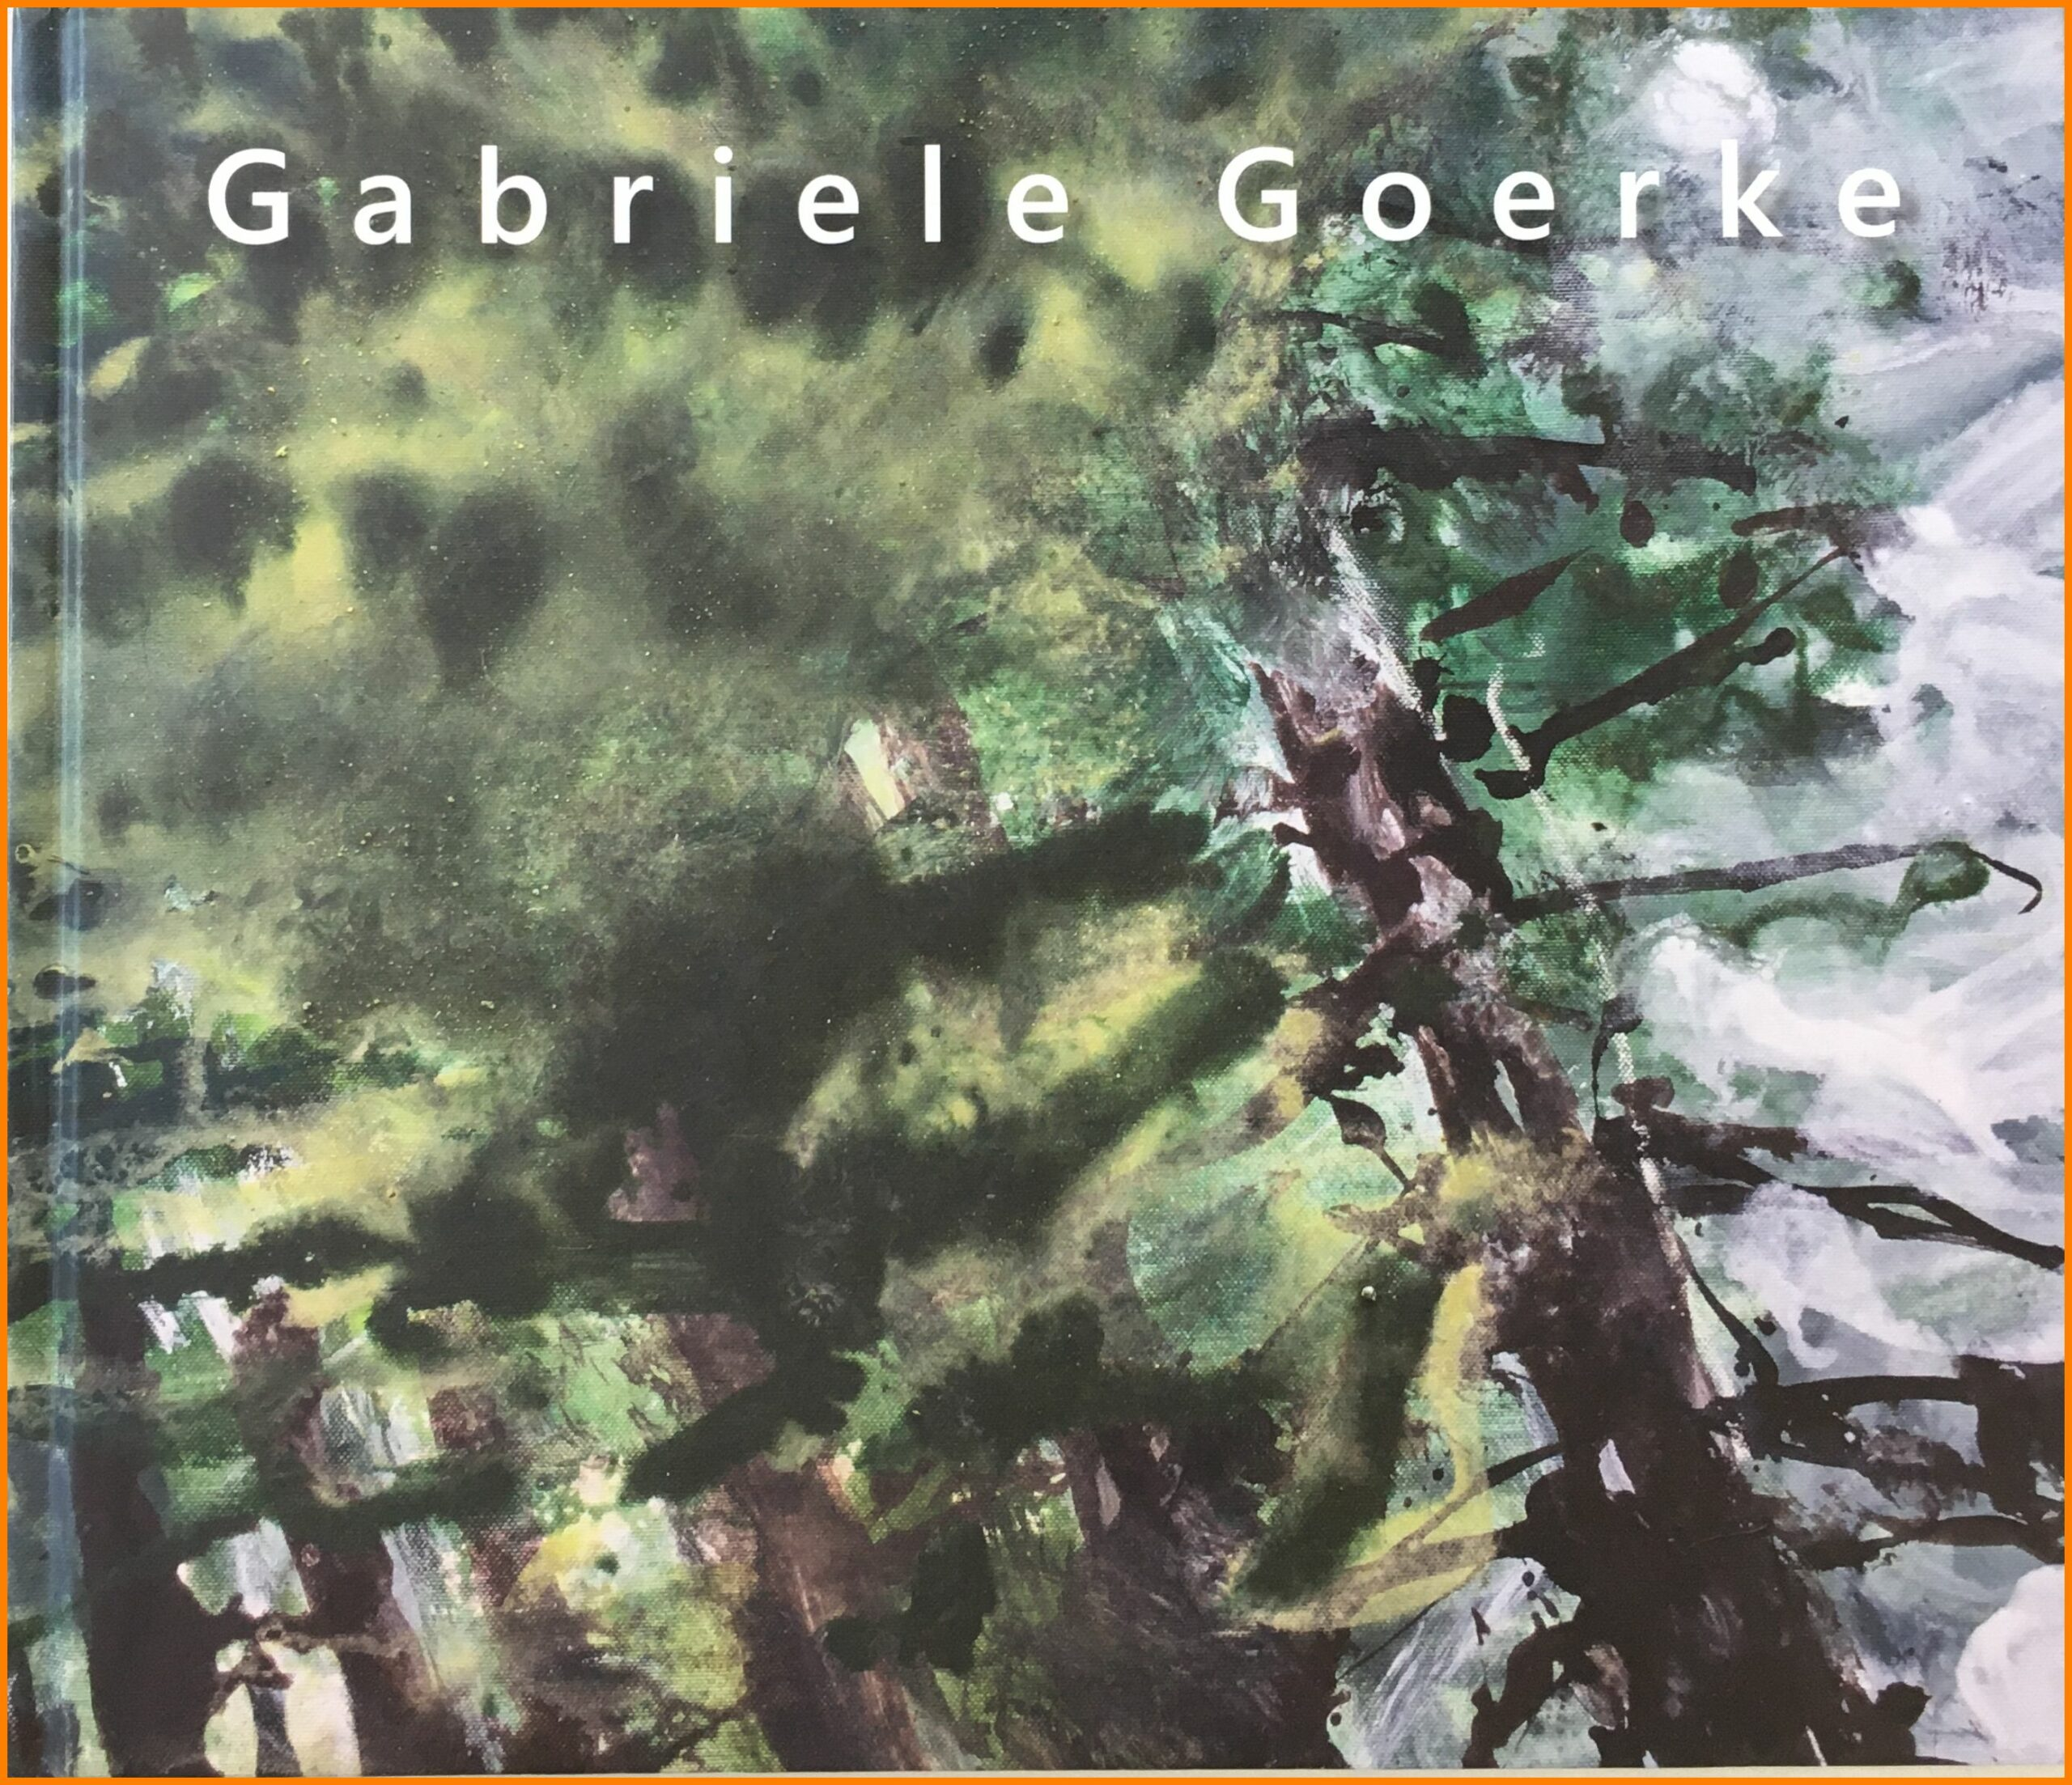 Gabriele Goerke